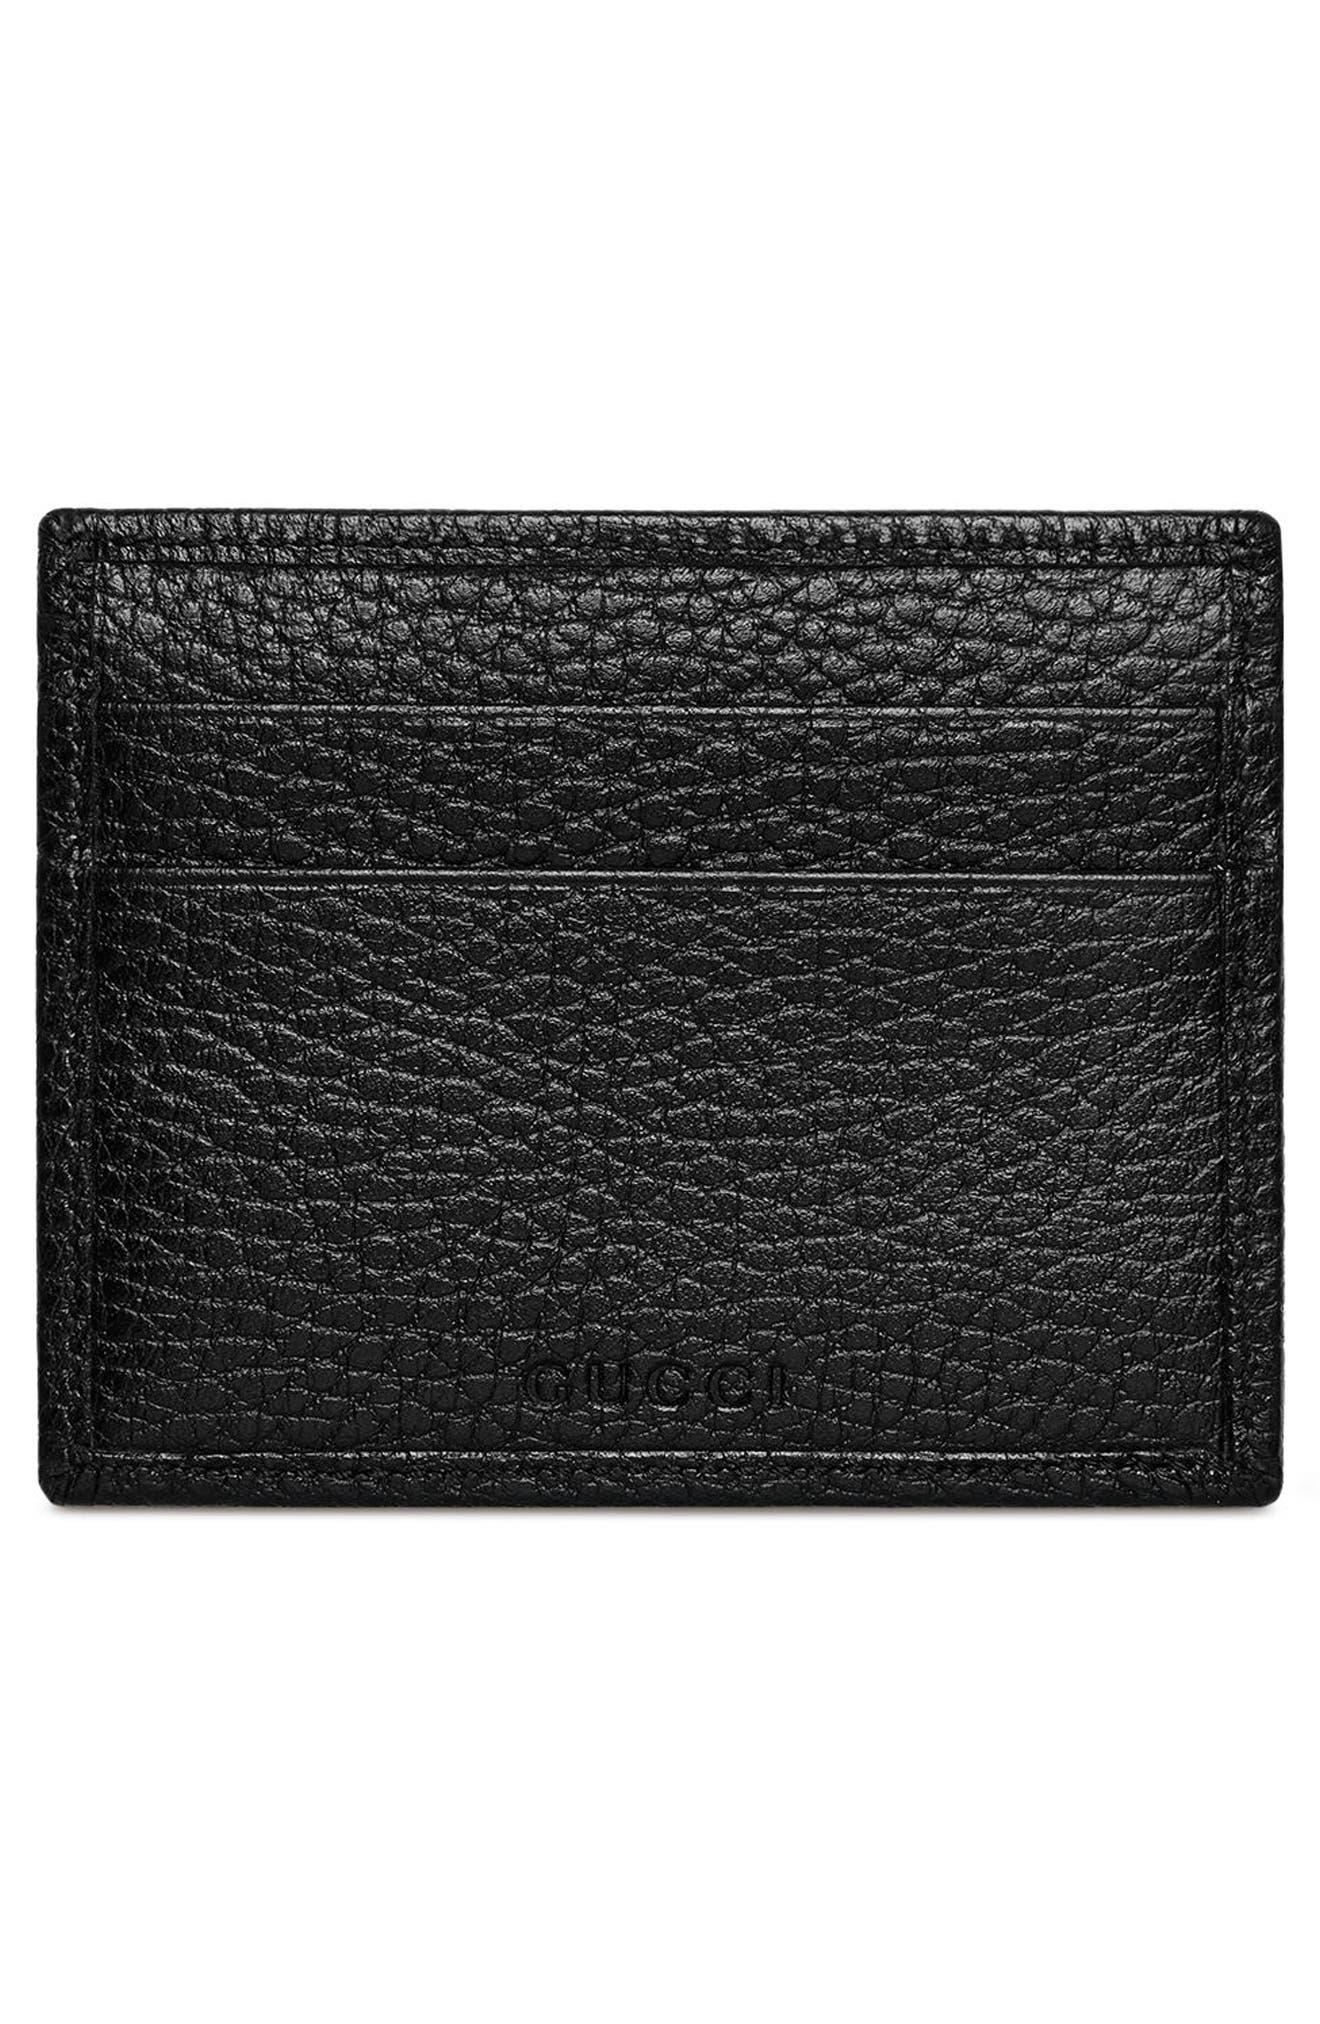 Farfalla Leather Wallet,                             Alternate thumbnail 4, color,                             NERO/ CRYSTAL